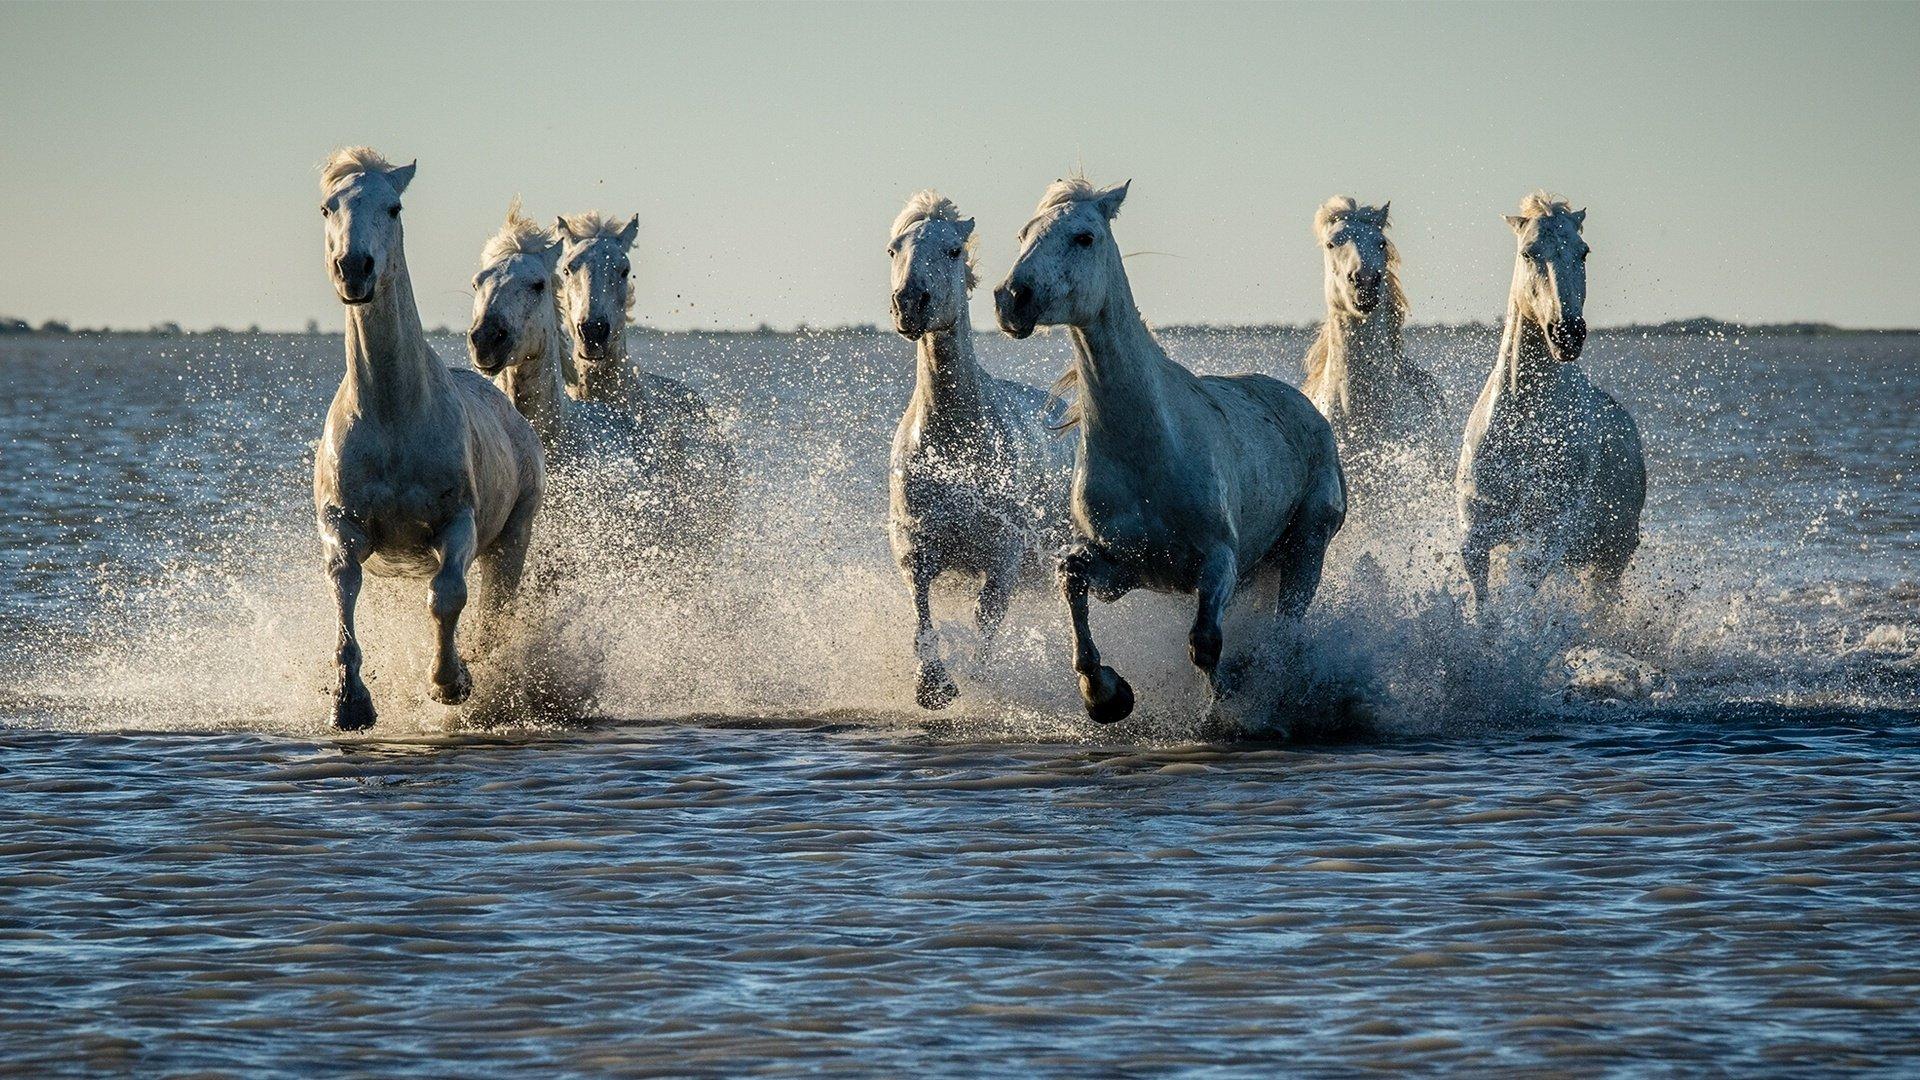 7 Horse Hd Wallpaper Free Download Free Hd Wallpaper